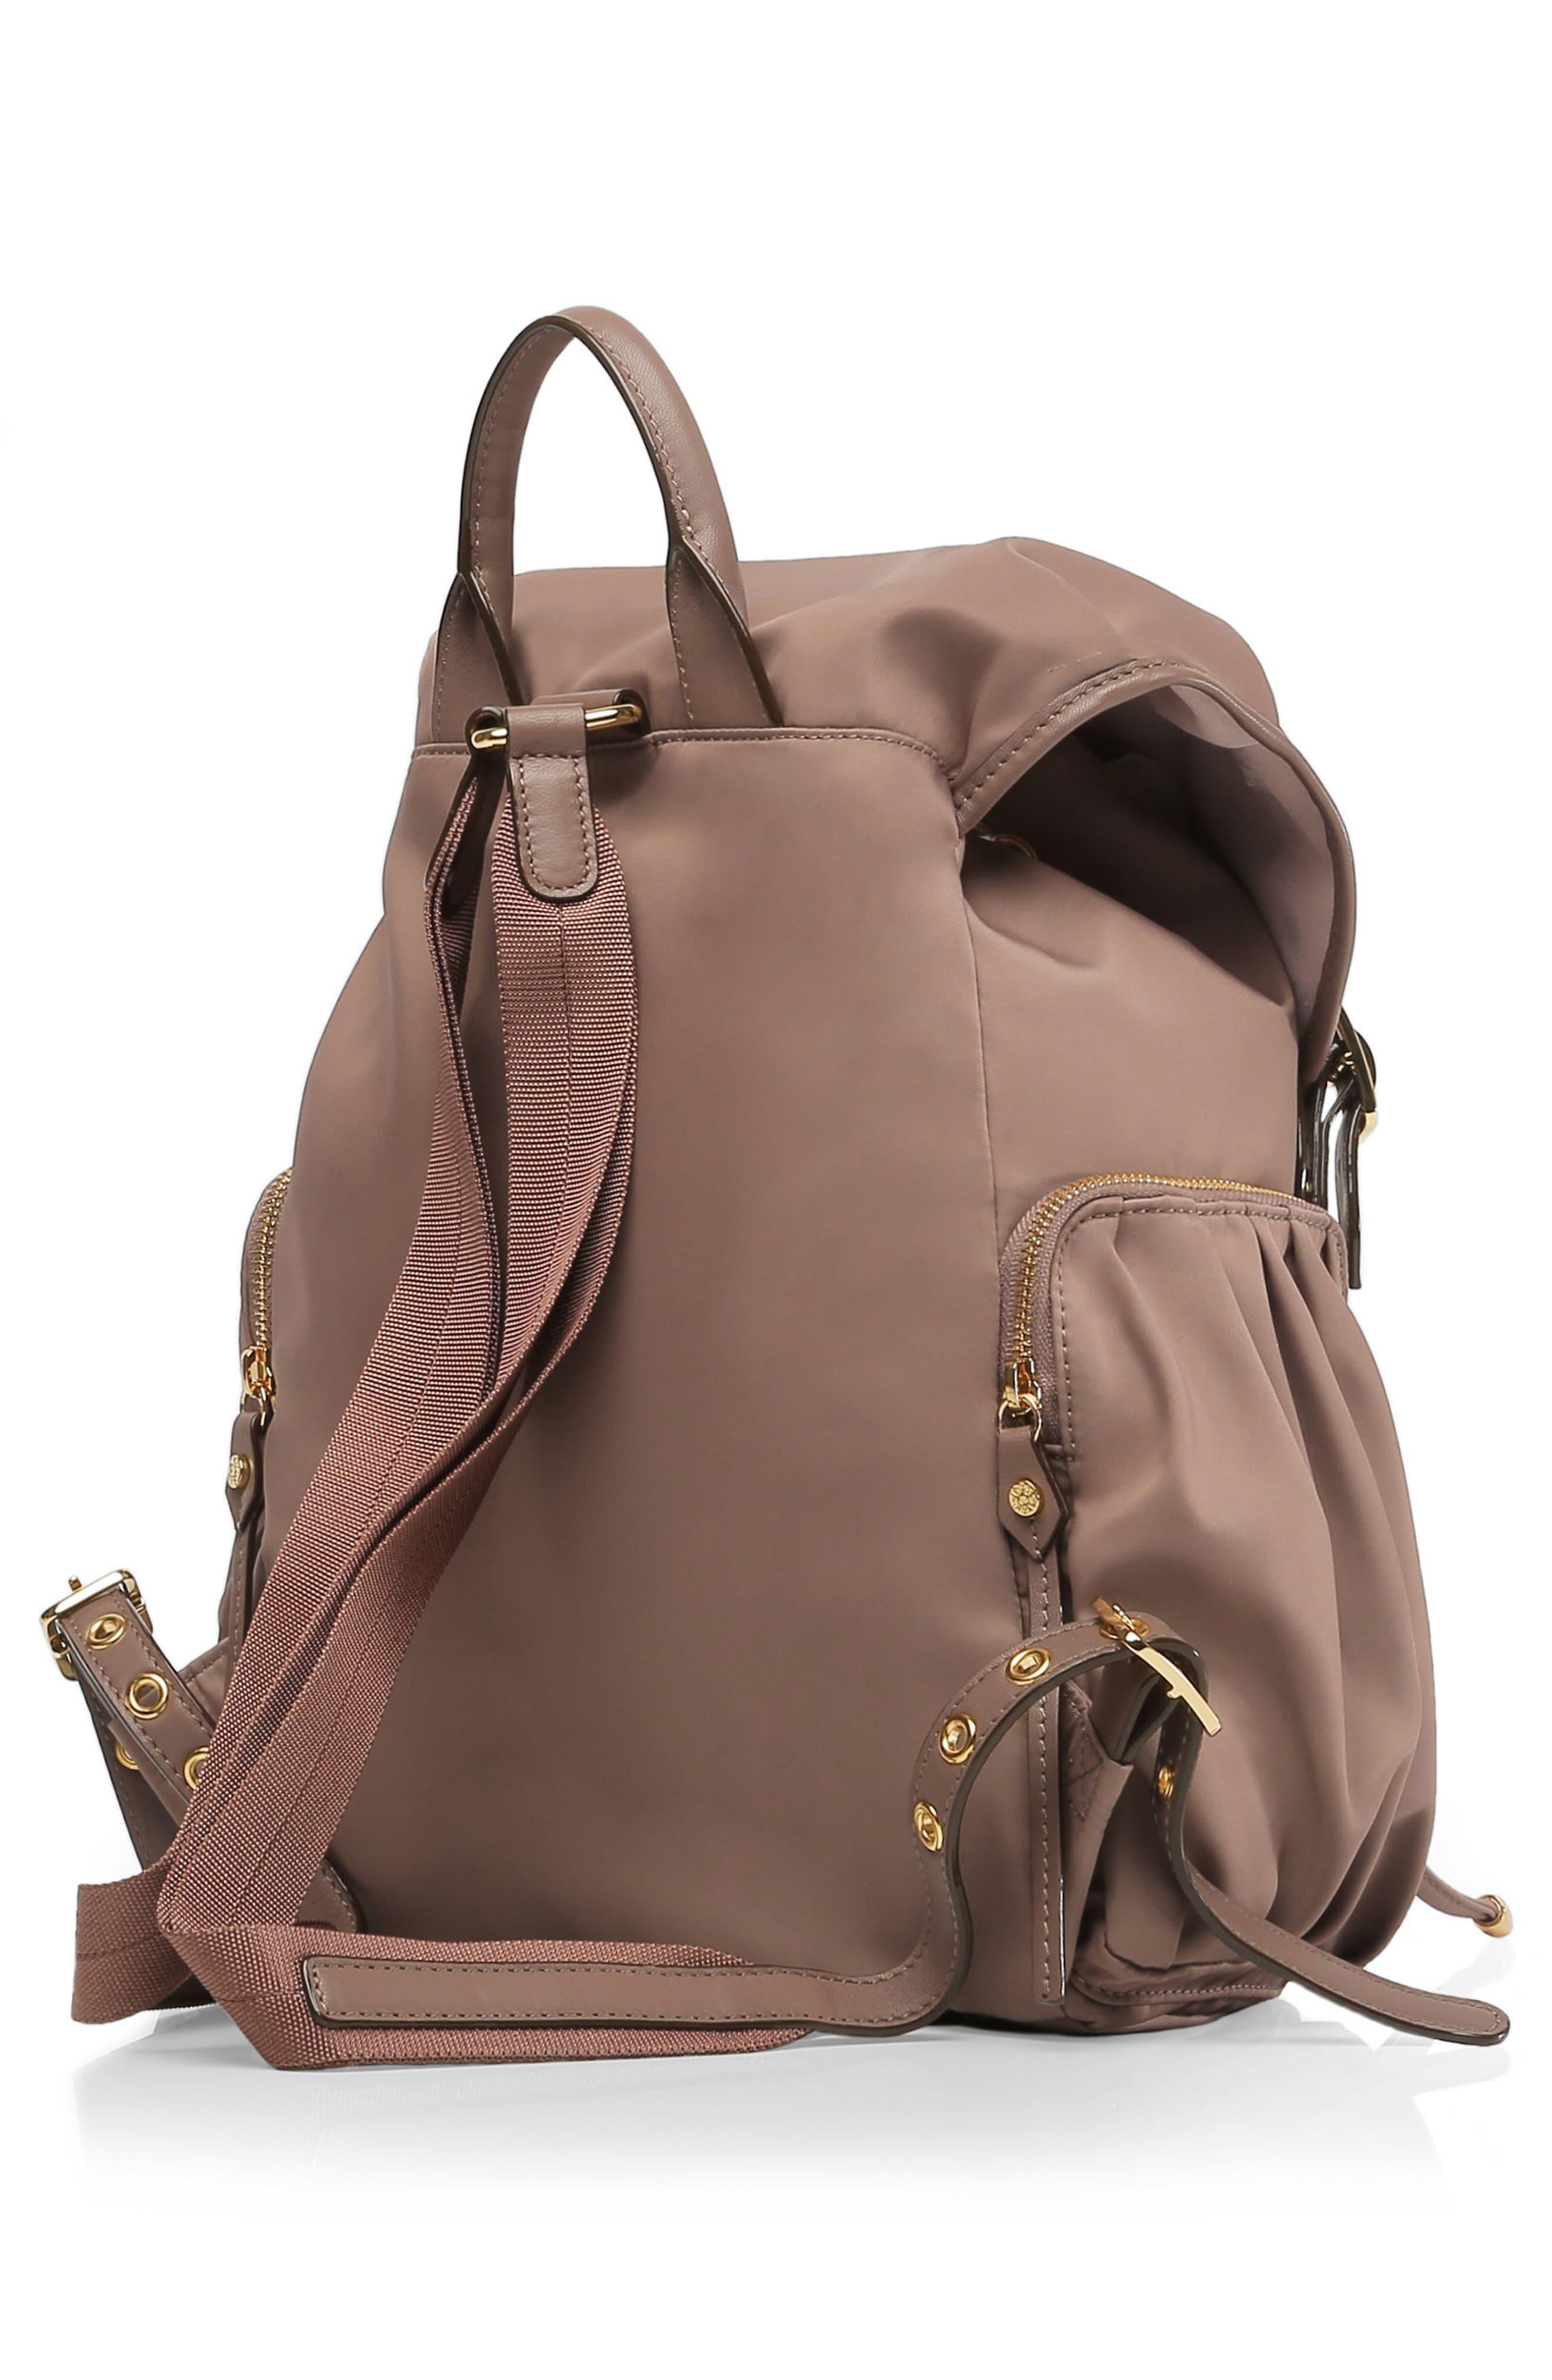 Marlena Backpack,                             Alternate thumbnail 3, color,                             255